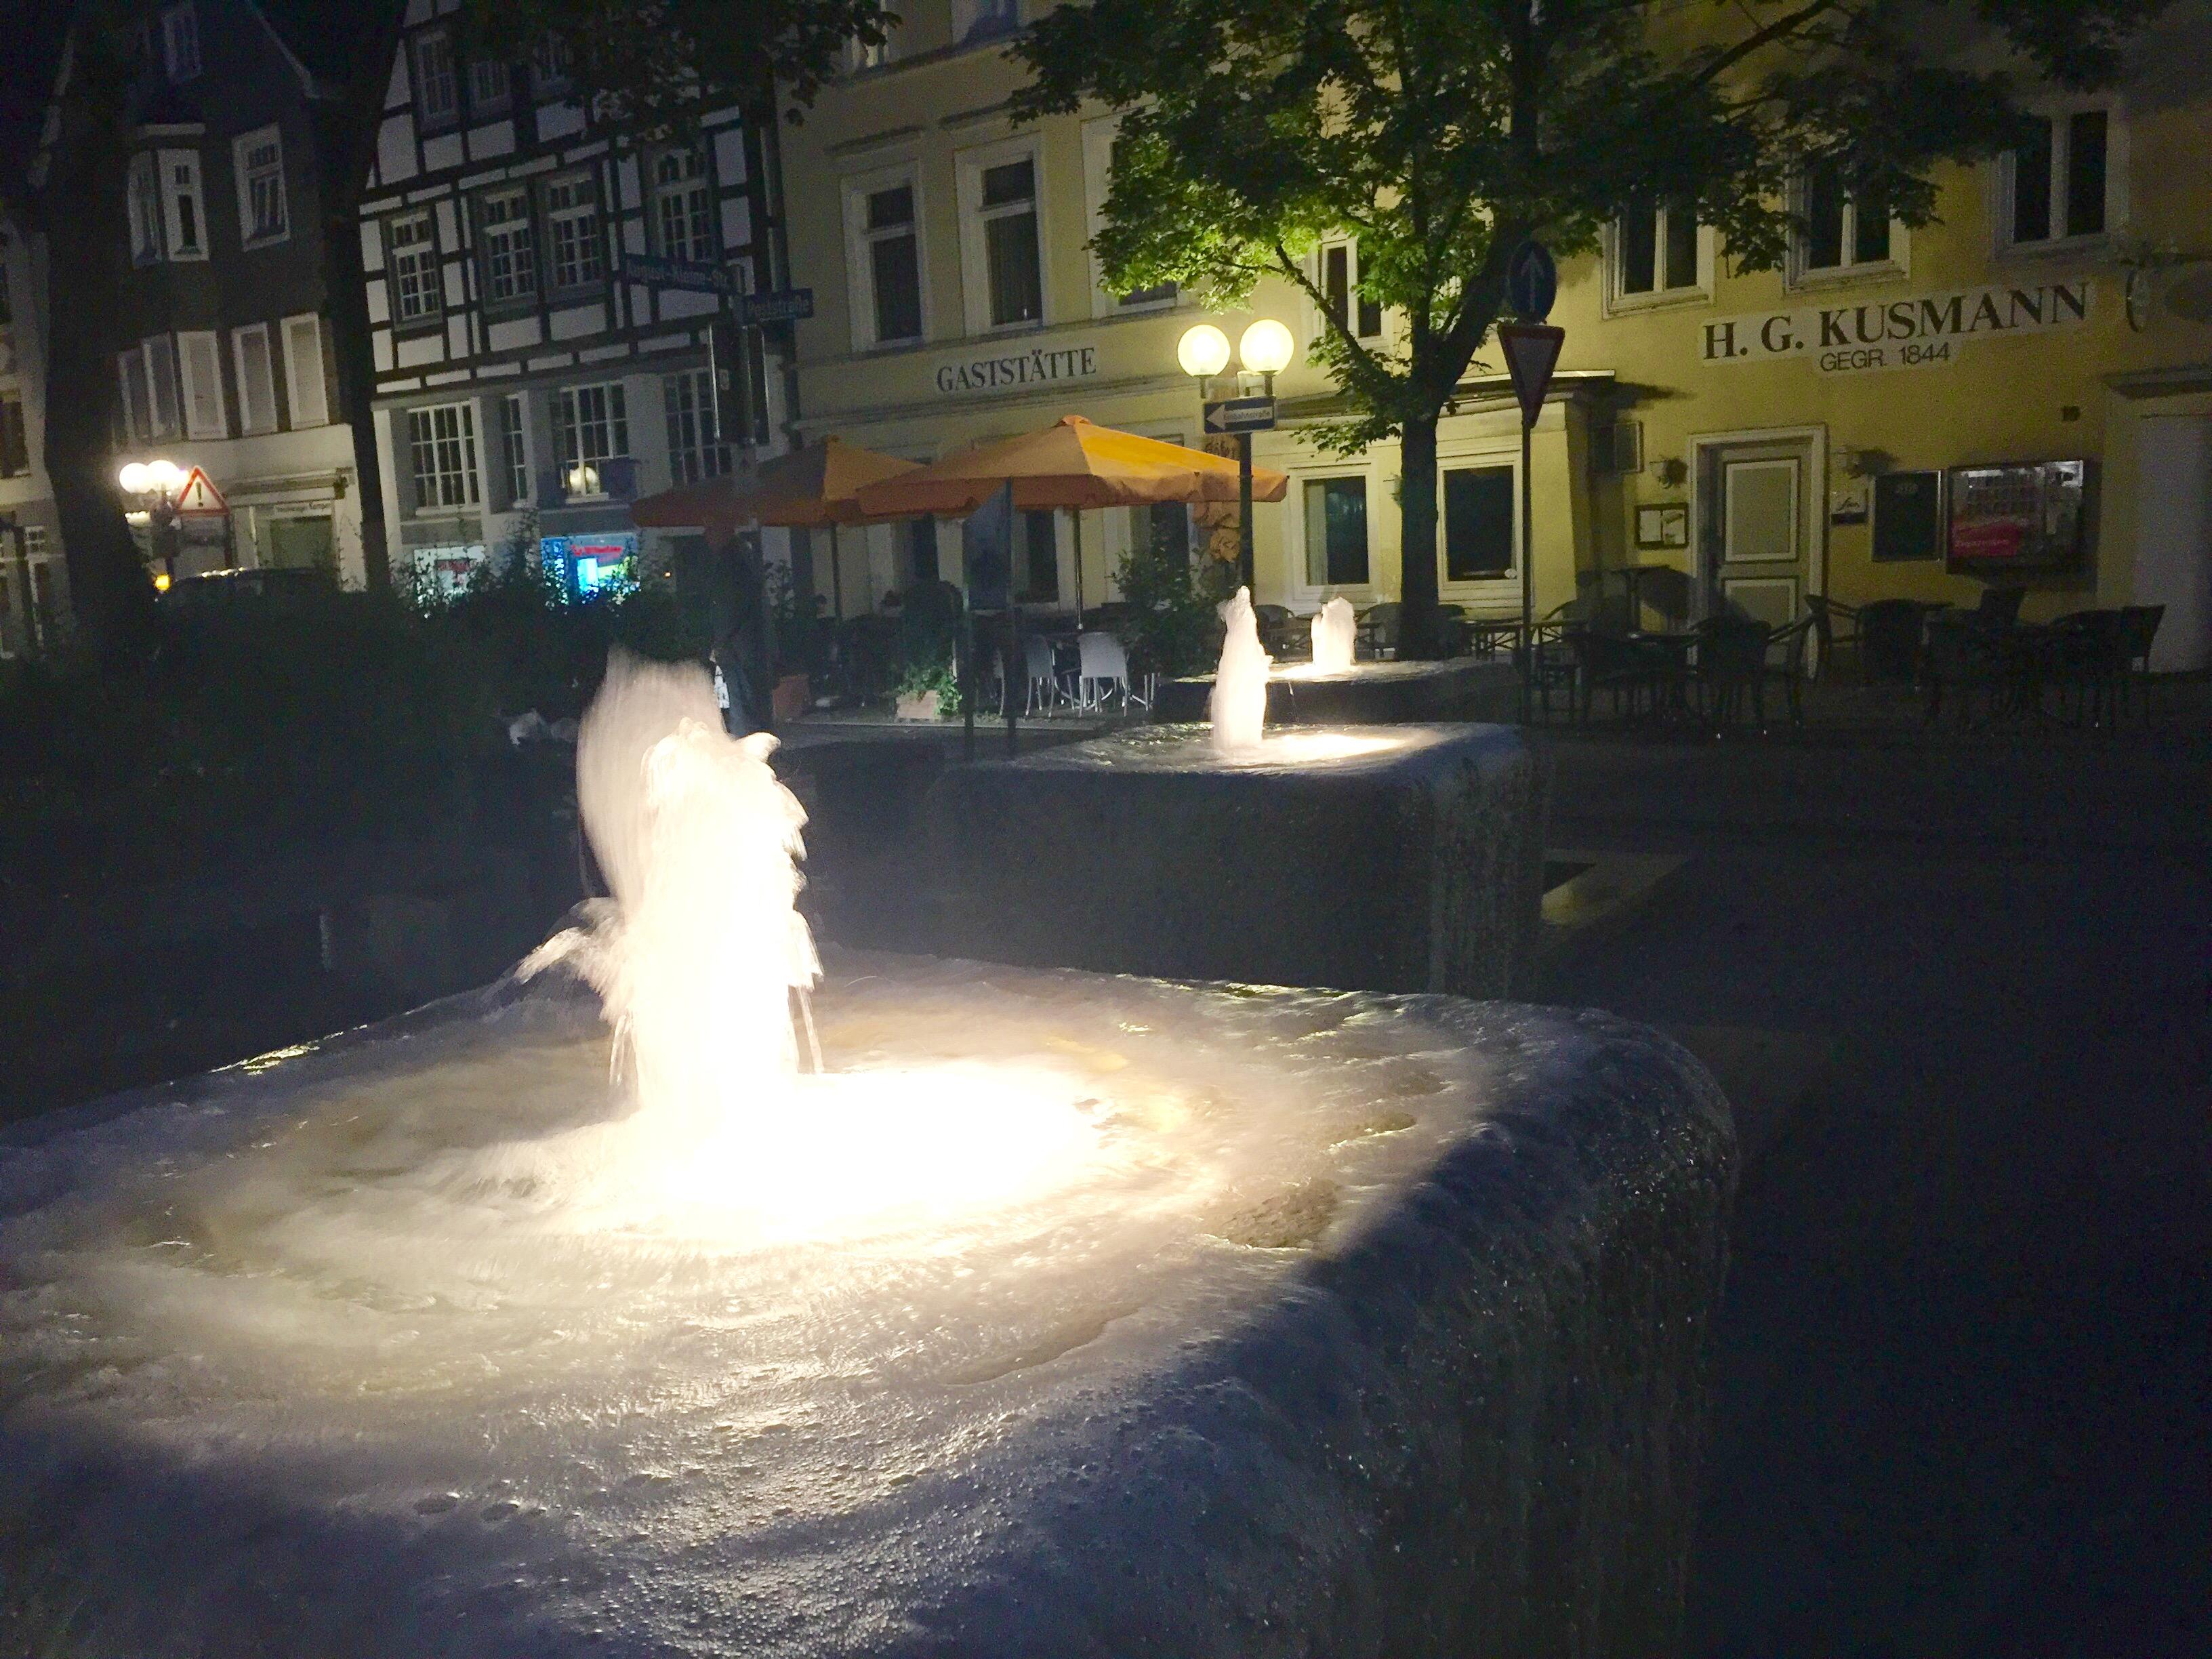 Kneipennacht in Lippstadt 2017